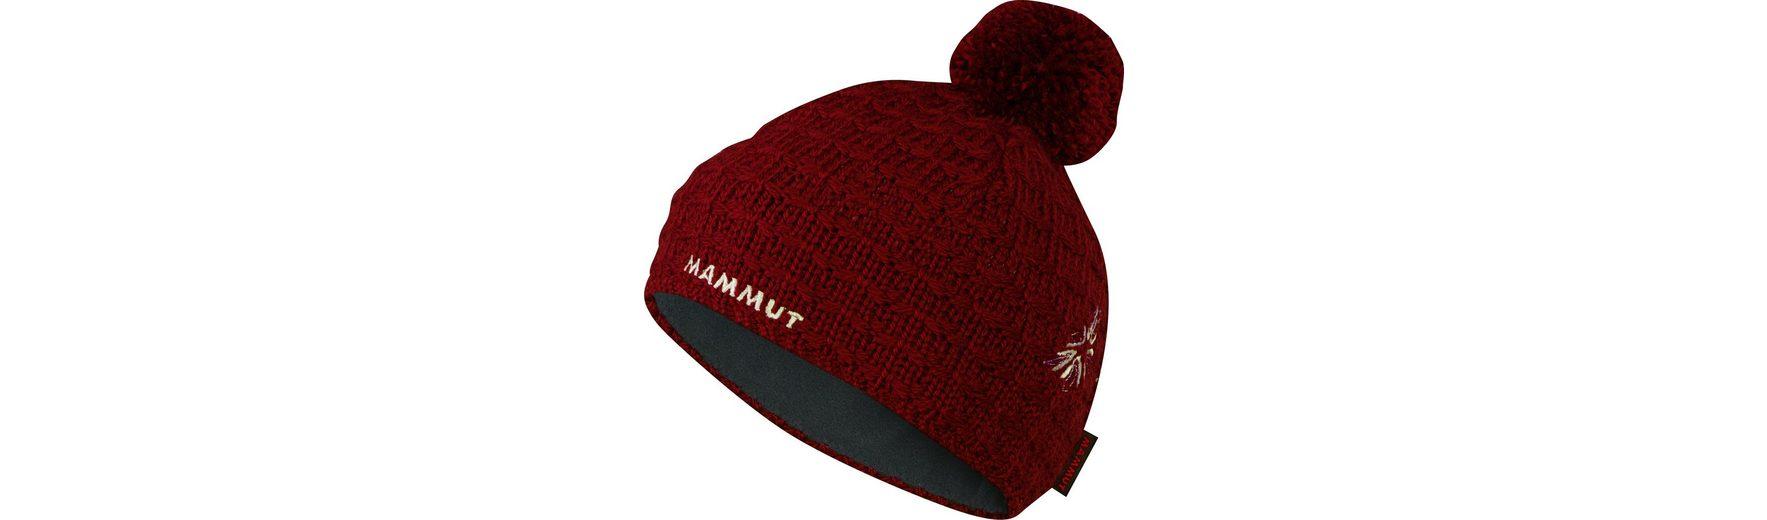 Mammut Hut »Pommel Beanie«